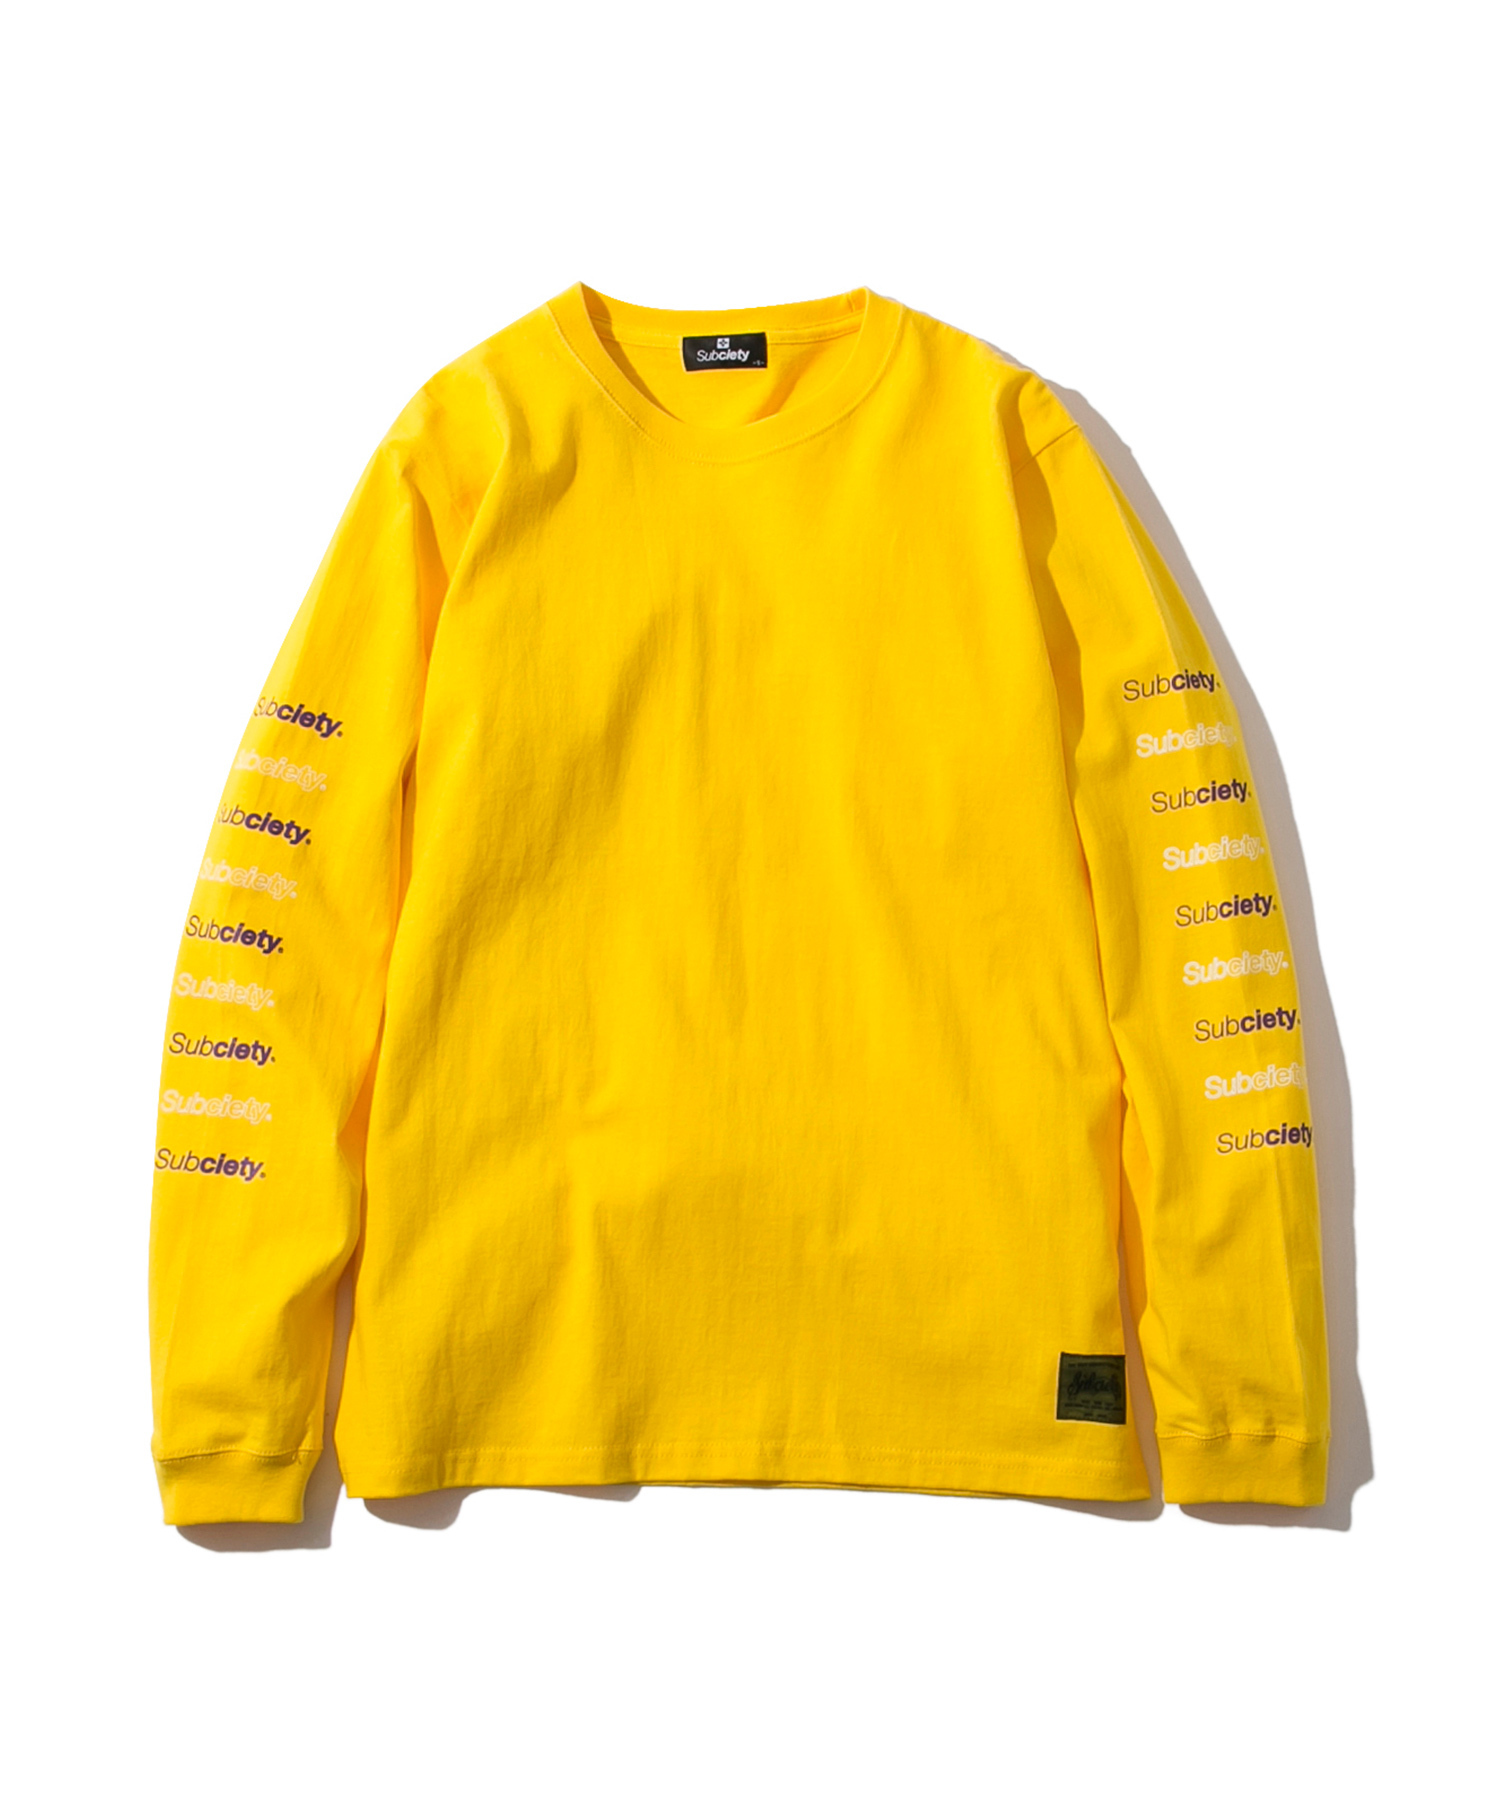 Subciety(サブサエティ) | RE:BASE L/S (Yellow)